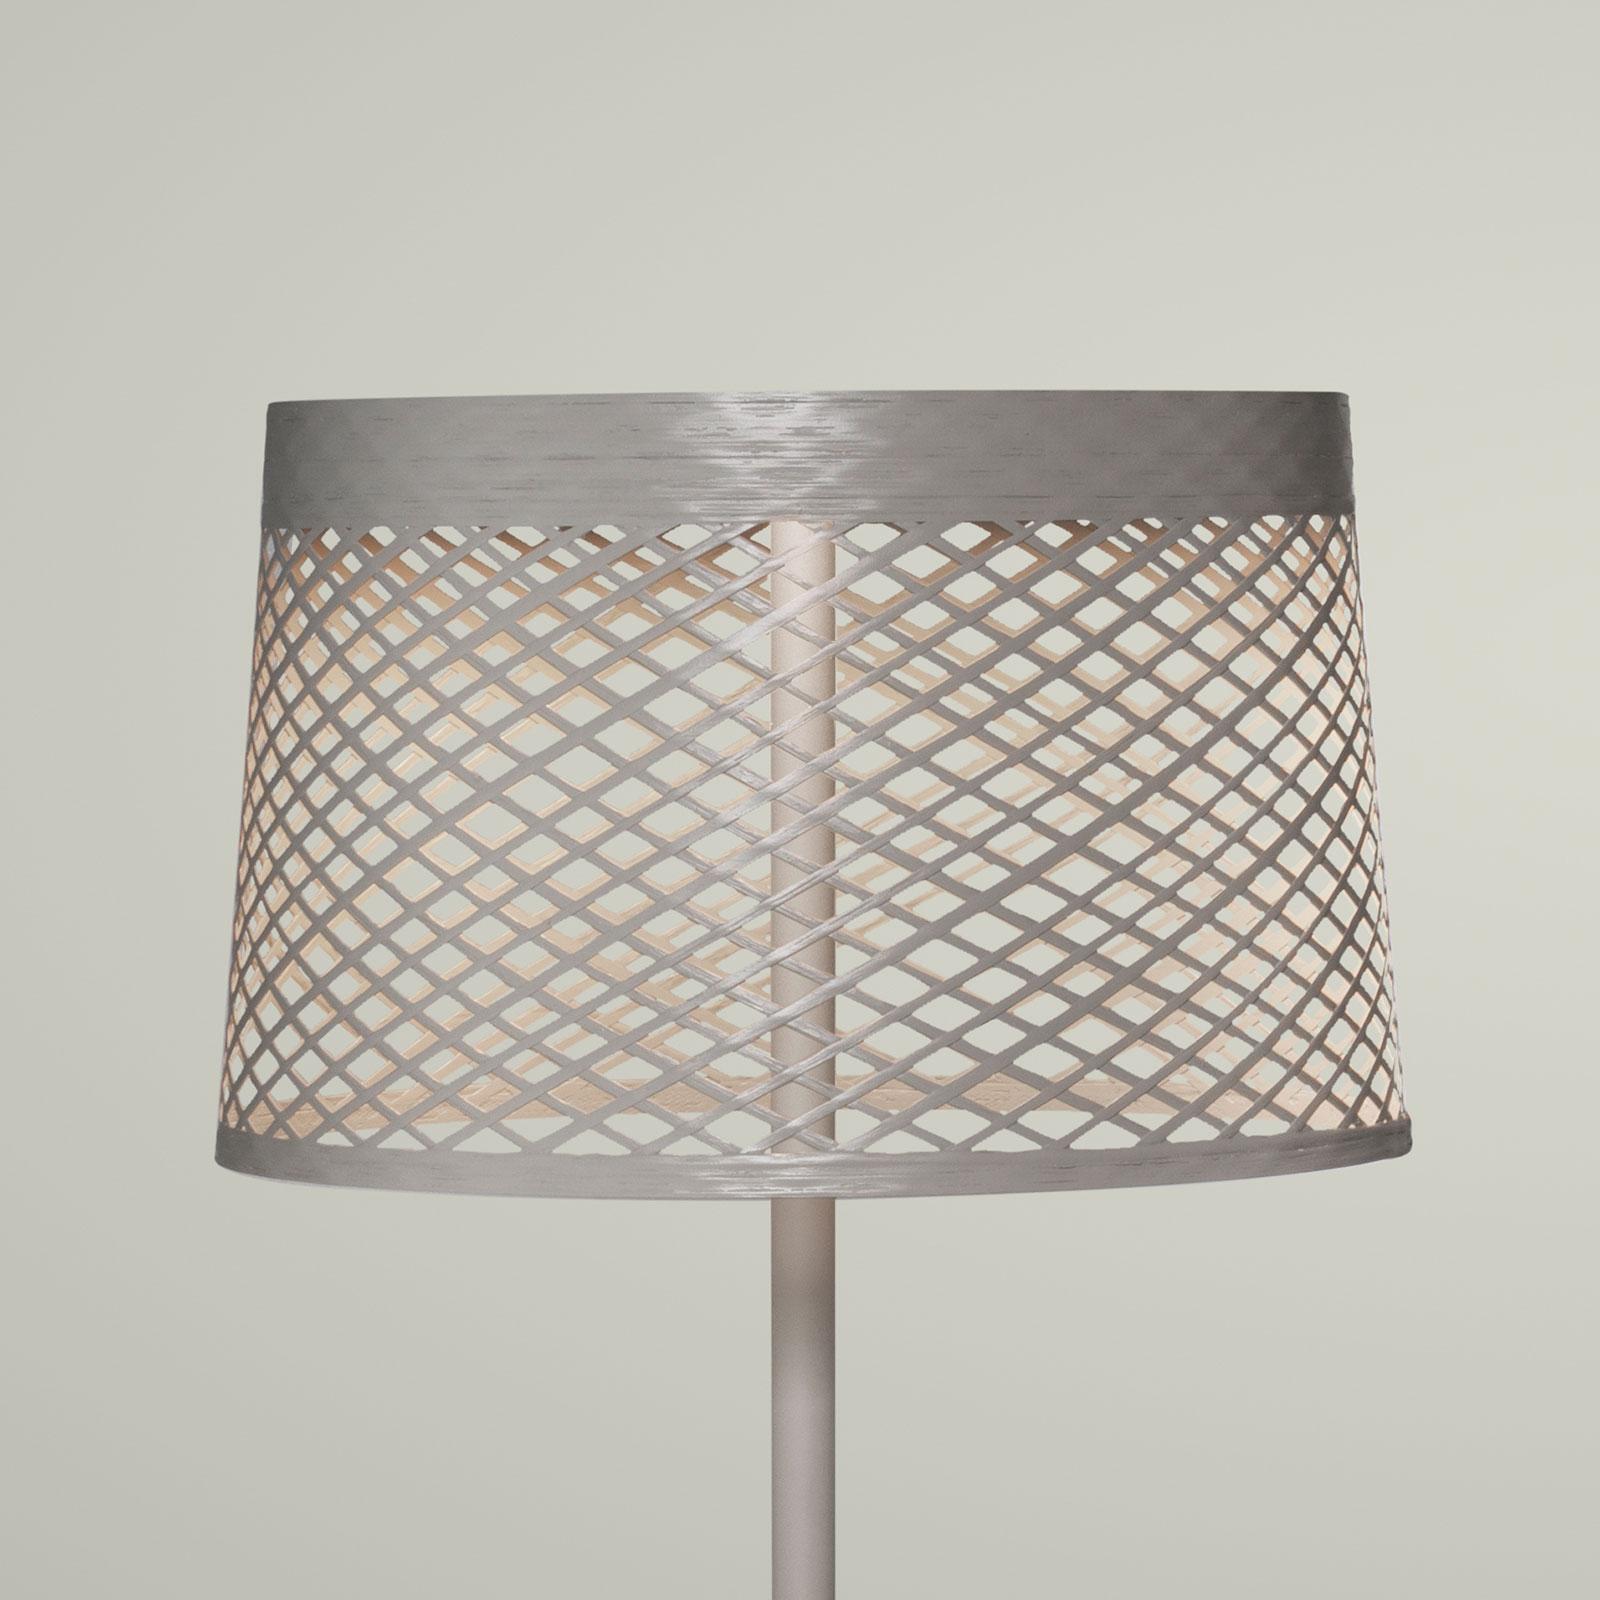 Foscarini Twiggy Grid lettura lampadaire, grège